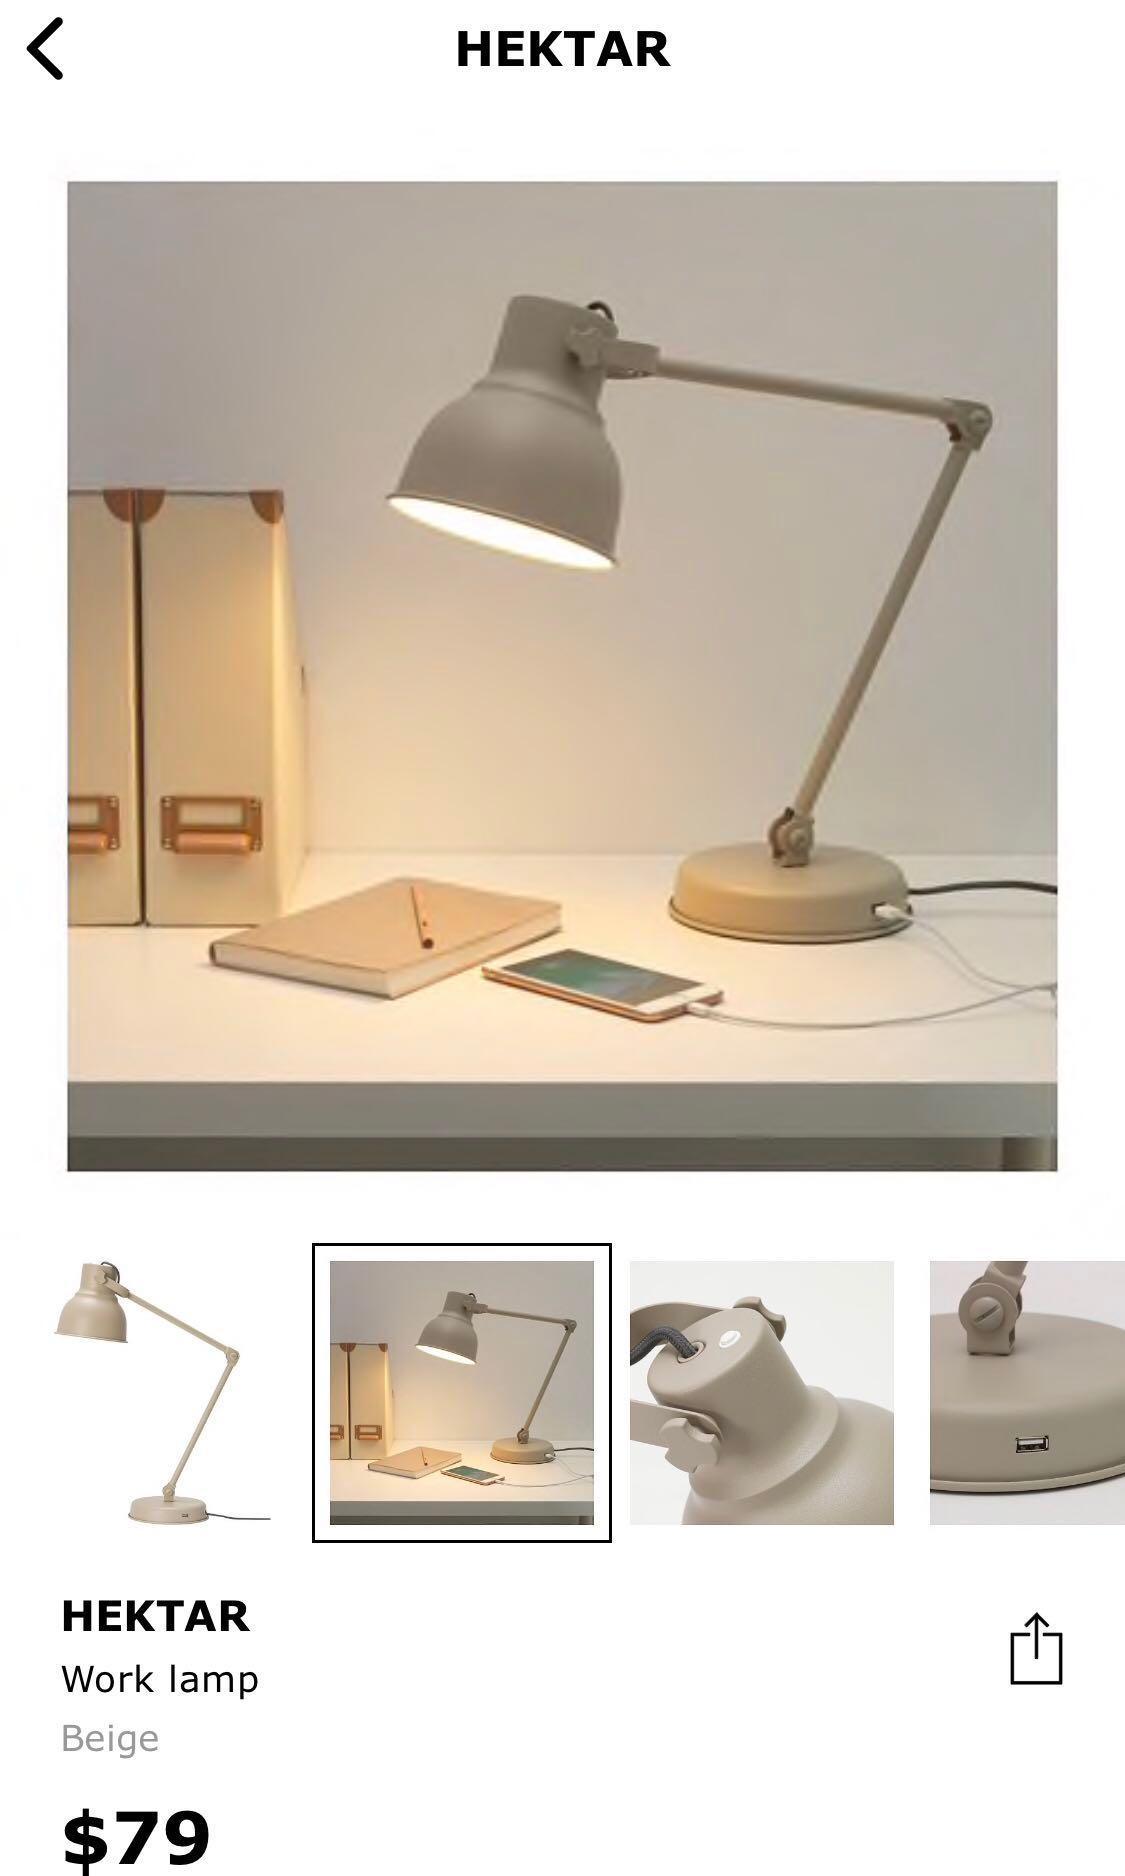 IKEA Hektar Beige Table Work Light/Lamp with USB Charging